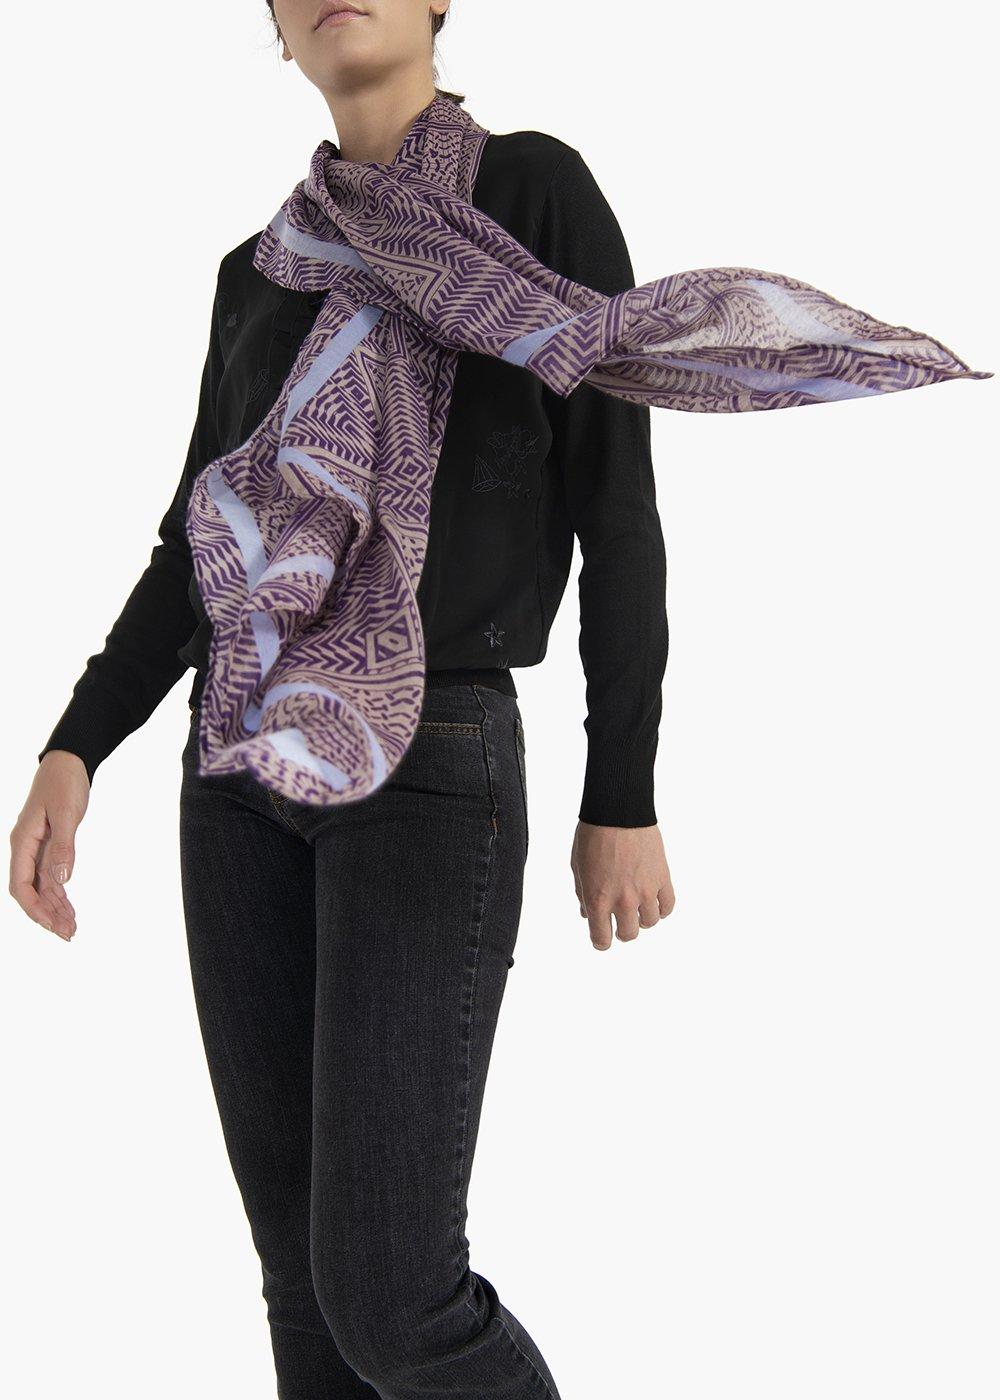 Sindy multicolour scarf with geometric designs - Polvere  /   Notte Fantasia - Woman